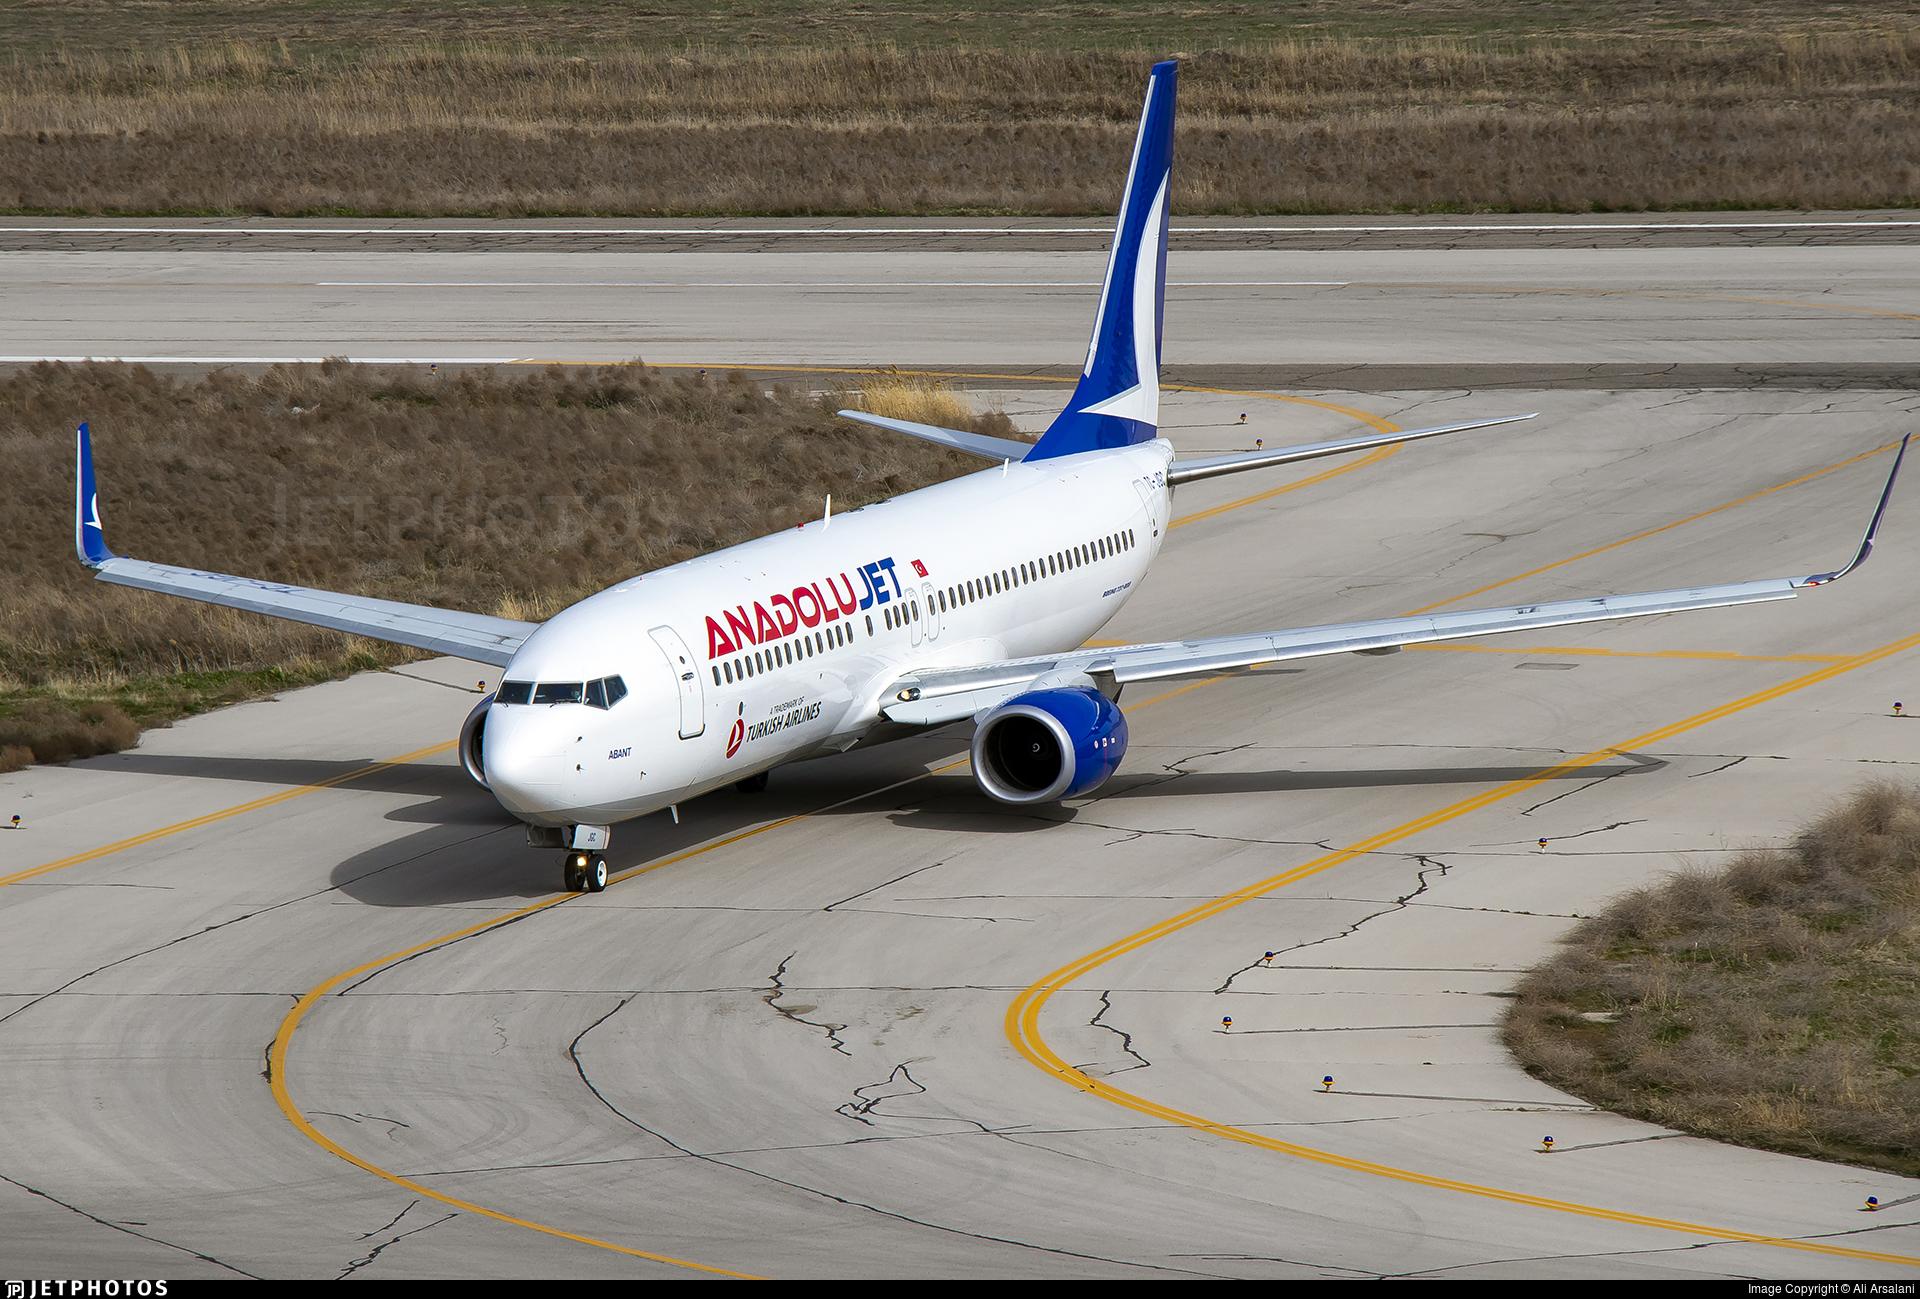 TC-JGC - Boeing 737-8F2 - AnadoluJet